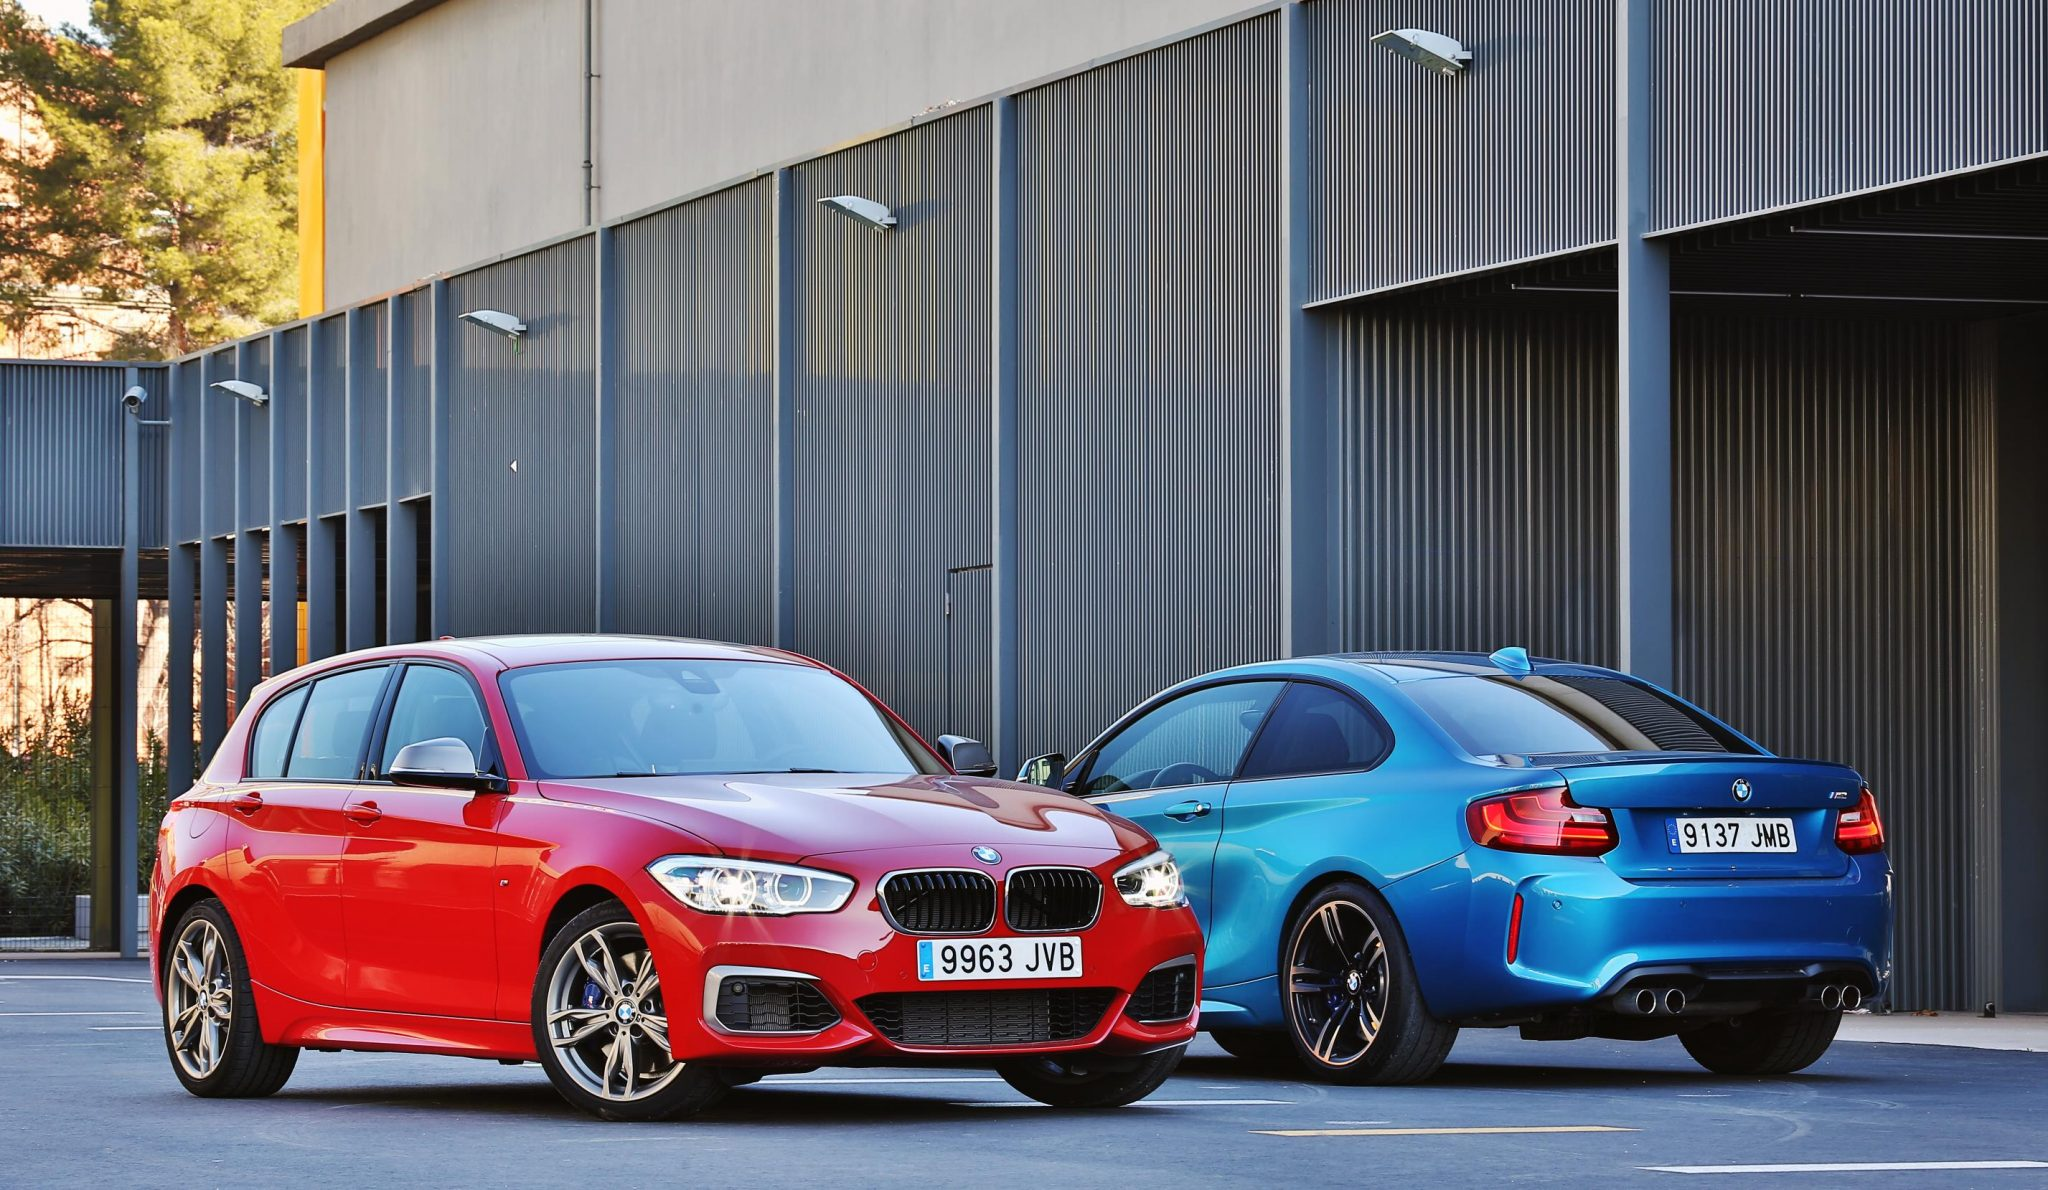 ¿Quién dijo crisis? BMW M y M Performance bate récords en España